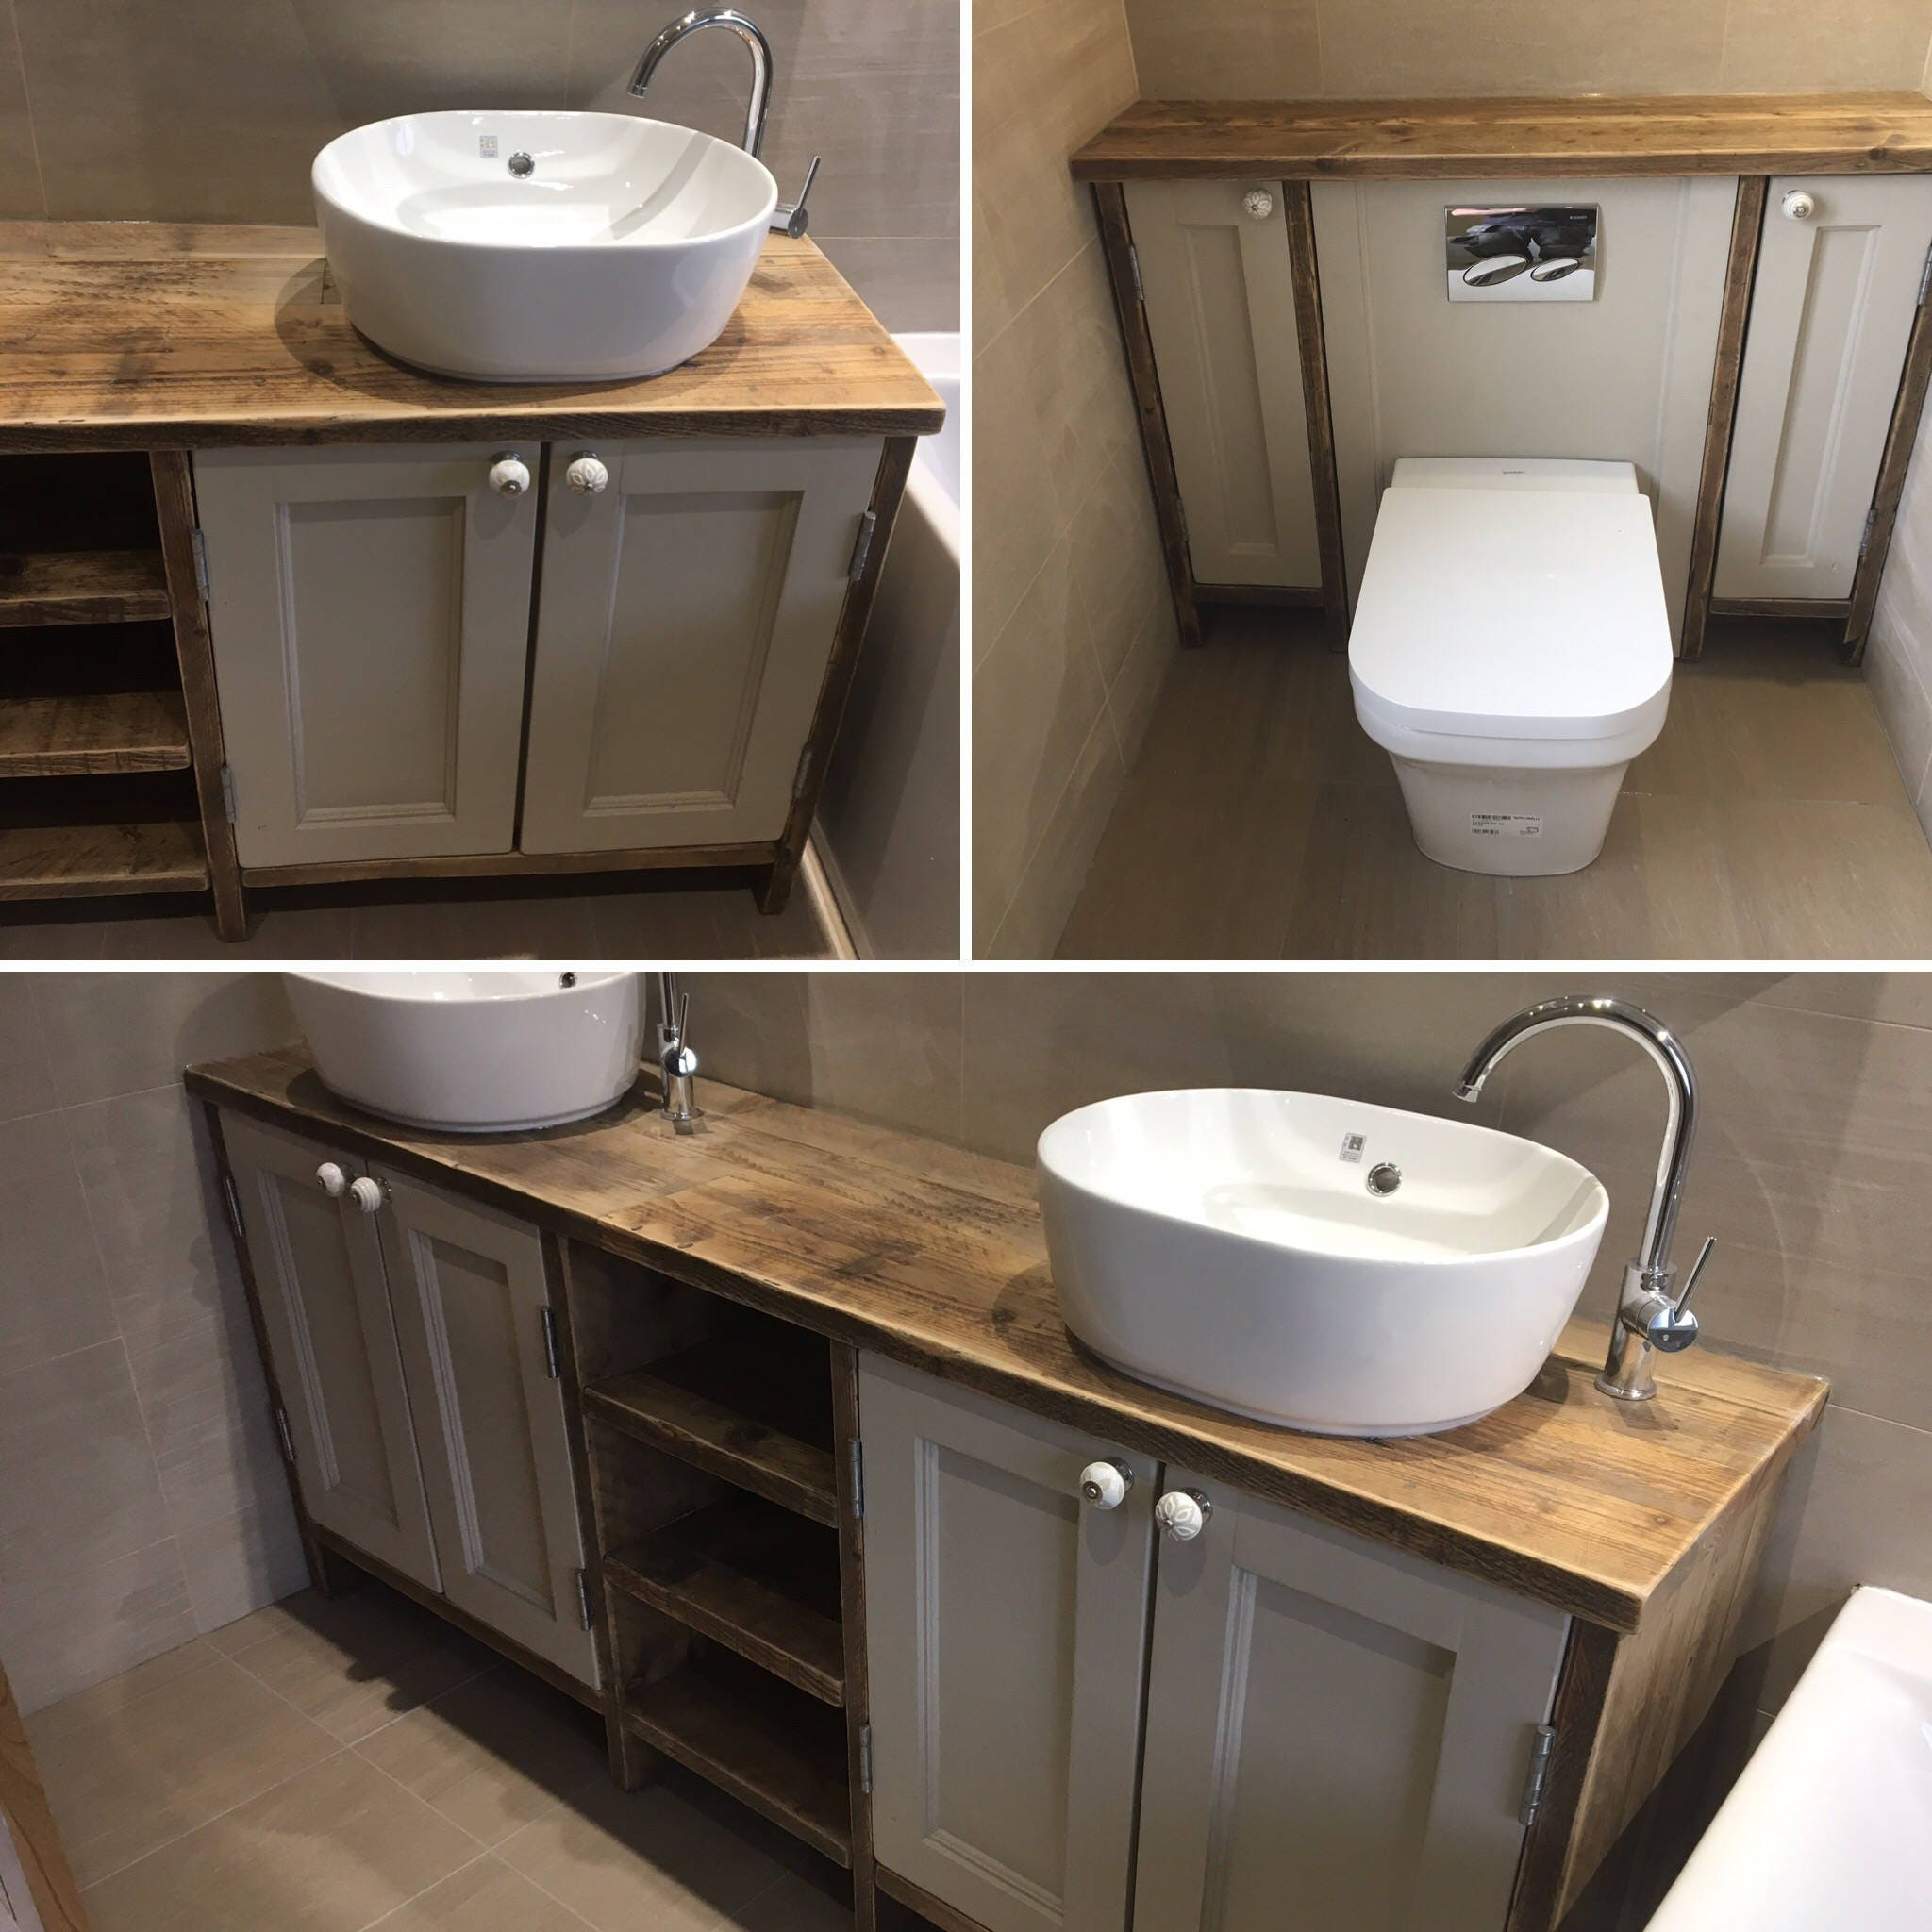 Bathroom Sinks Edinburgh edinburgh -reclaimed wood washstand handmade & bespoke